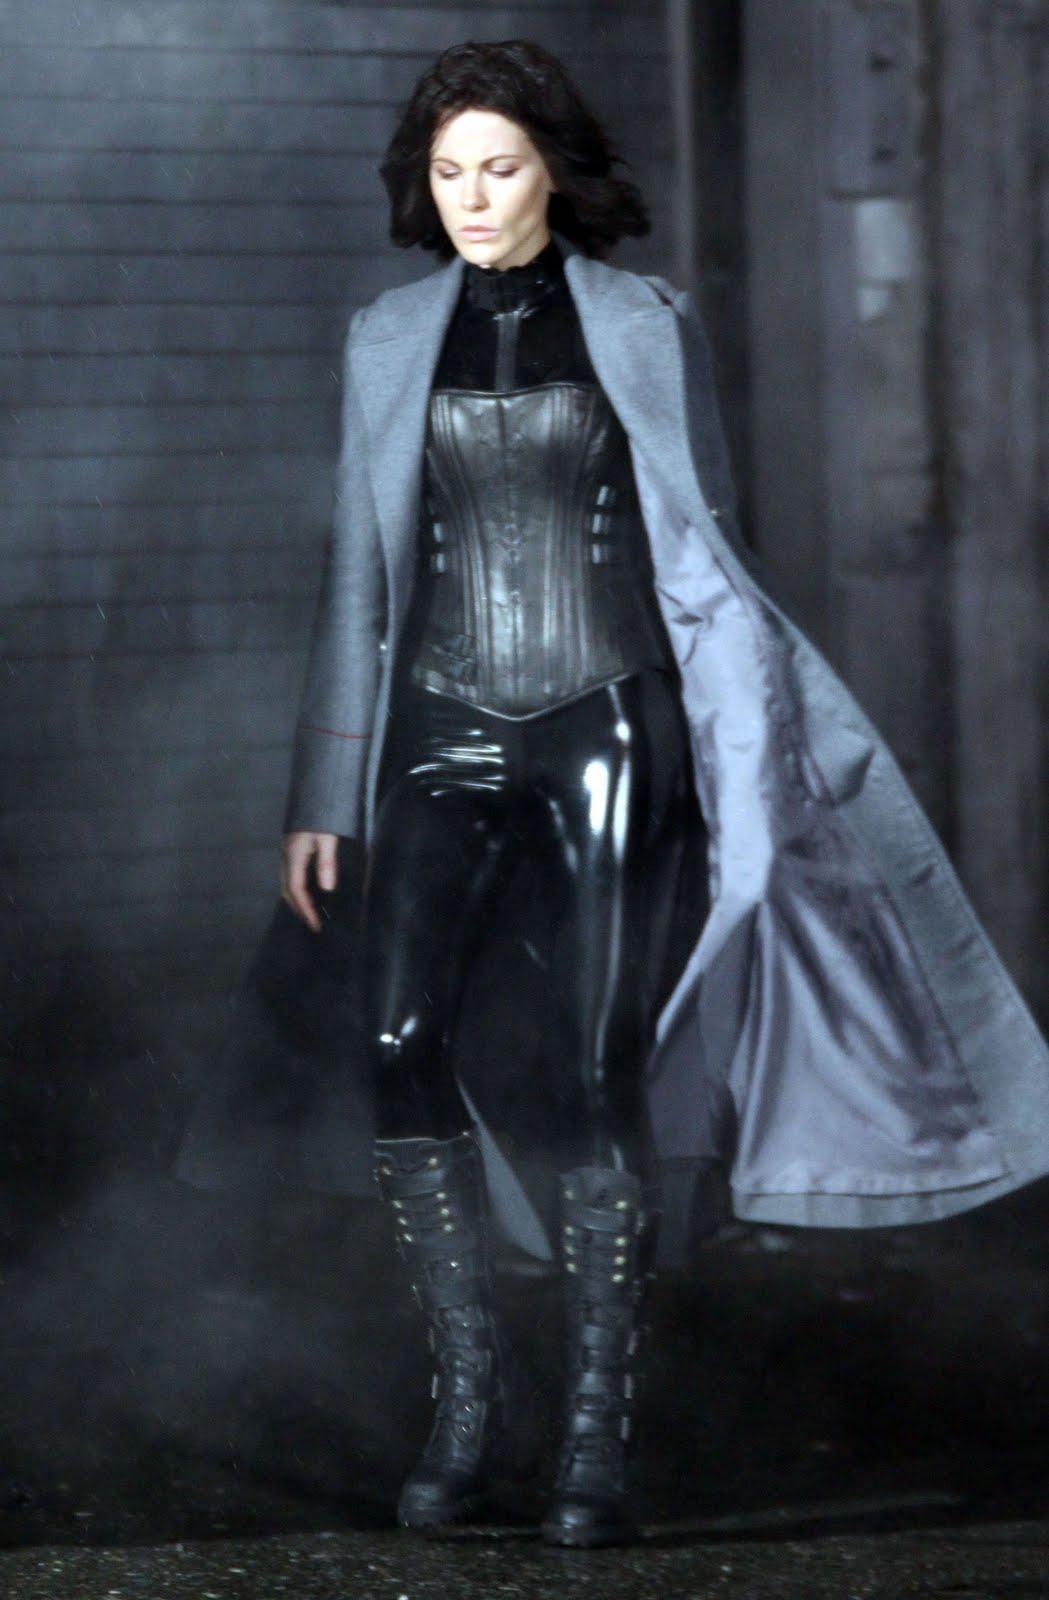 http://4.bp.blogspot.com/-gRvDKAgTMmA/TYCYYS50BJI/AAAAAAAAHN8/tiQyXB_OGgM/s1600/celebskin_kate_beckinsale_leather_latex_catsuit_corset_boots_underworld_candids_5.jpg